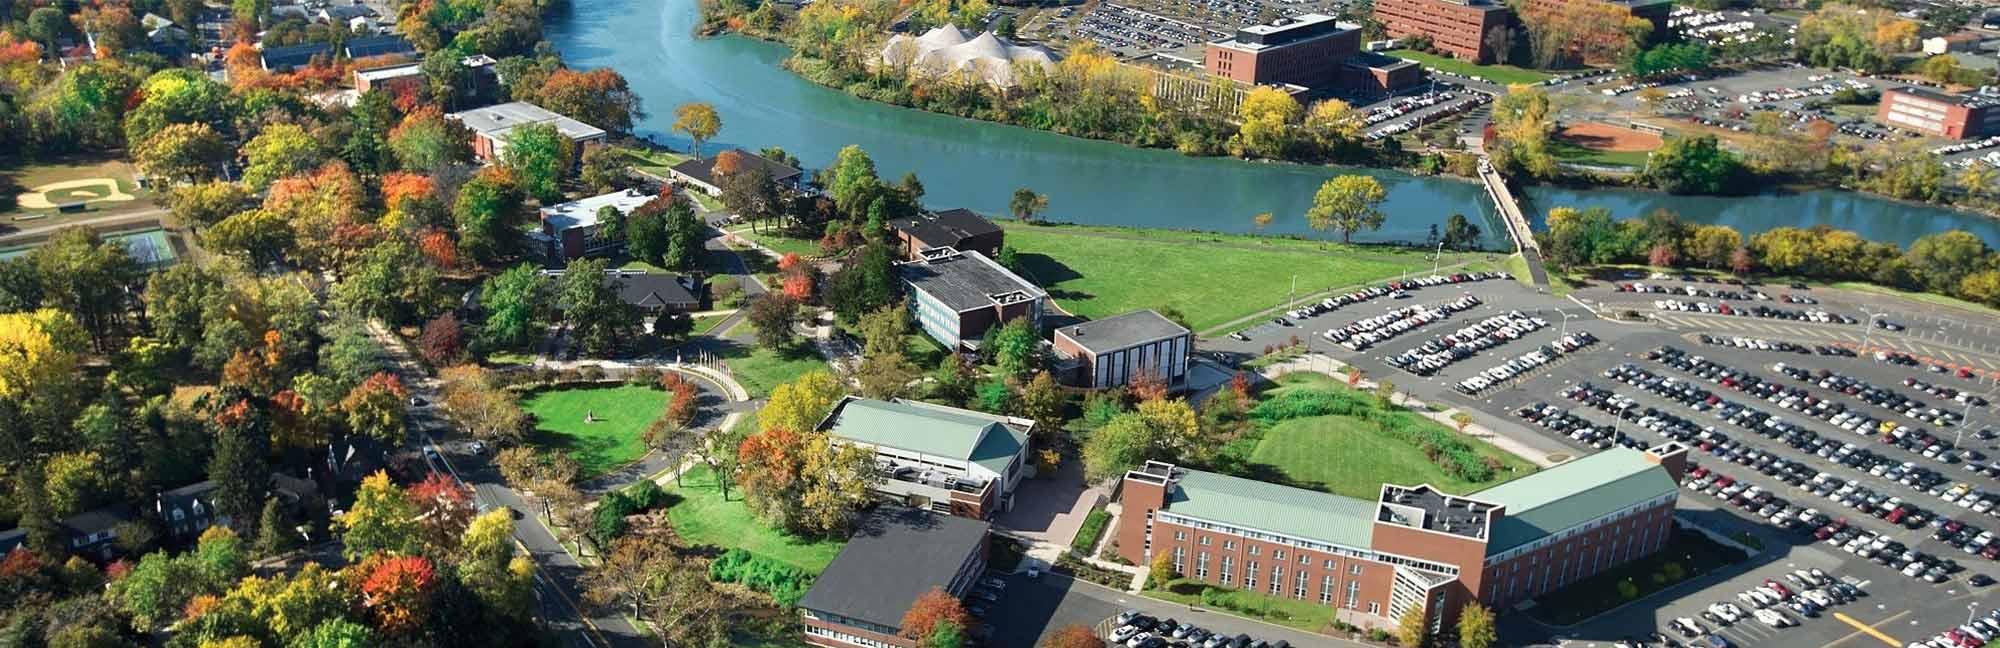 Fairleigh Dickinson University - Metropolitan Campus - Niche Intended For Fairleigh Dickinson University Winter Break